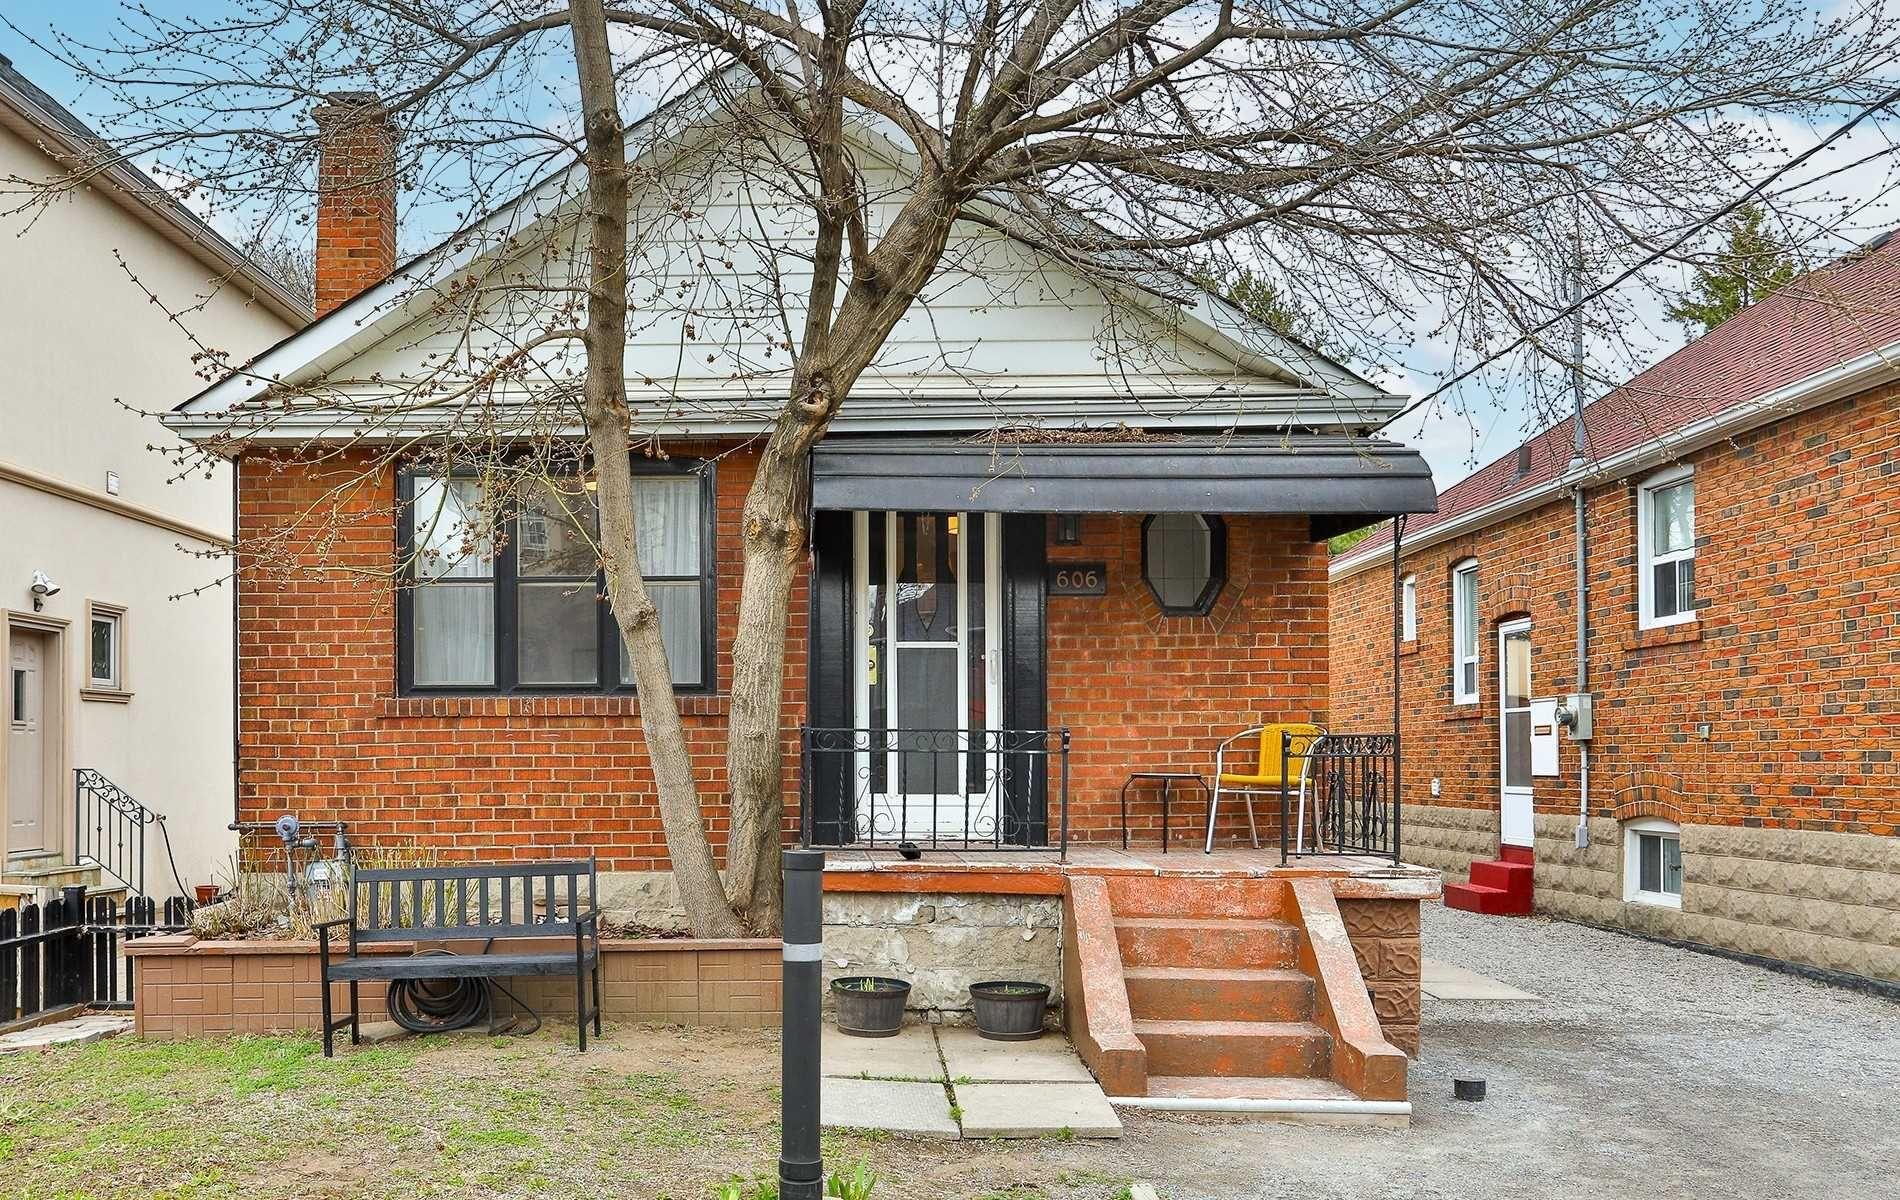 Main Photo: 606 Mortimer Avenue in Toronto: Danforth Village-East York House (Bungalow) for sale (Toronto E03)  : MLS®# E5191733